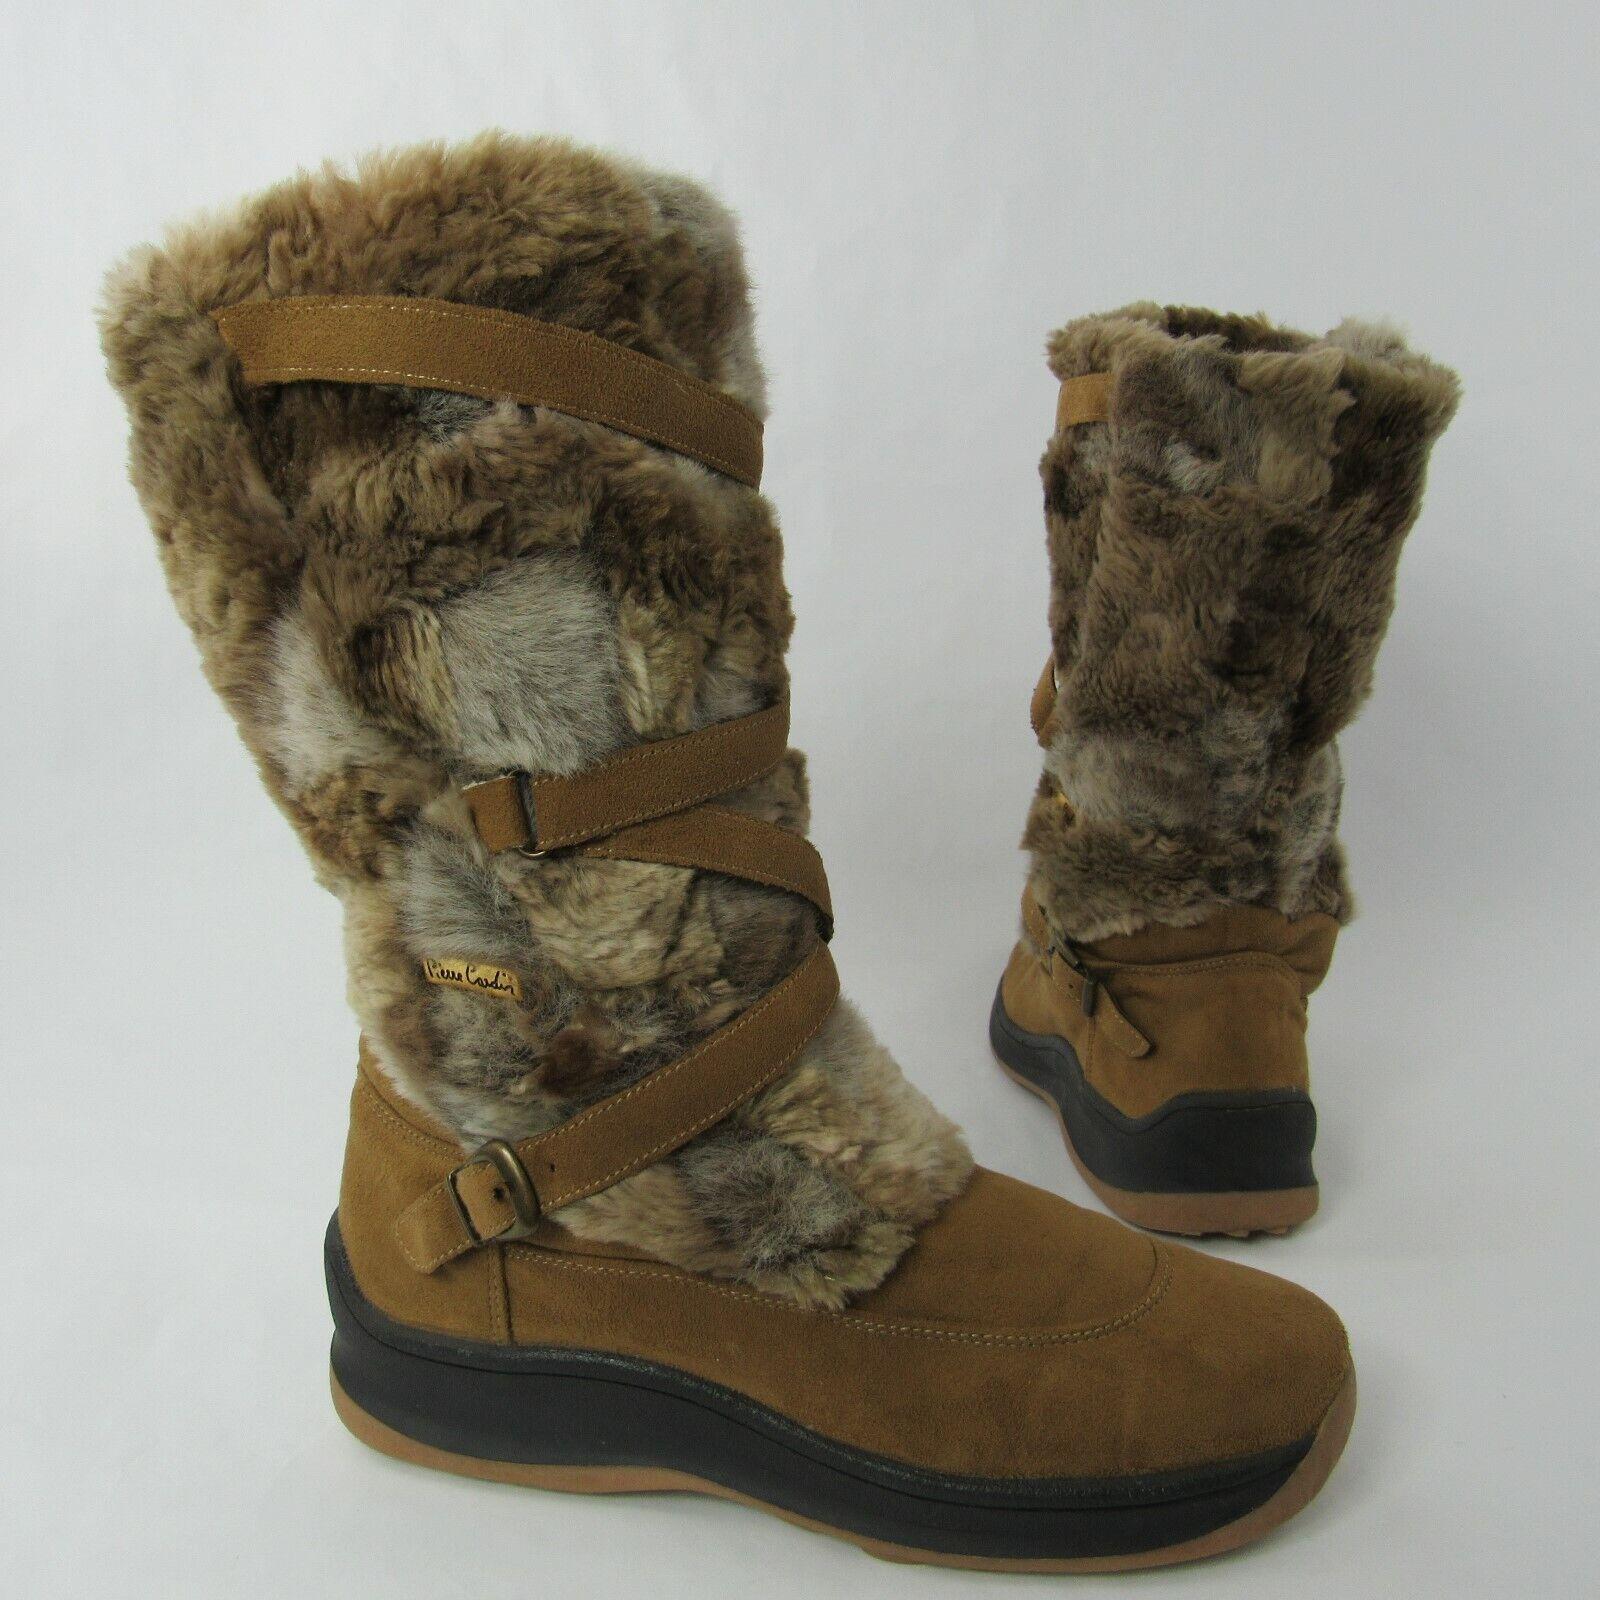 Pierre bildin Drag on stövlar Storlek 40 40 40 EU 9 US Shearling Lined skor sammet Faux Fur  kampanjer